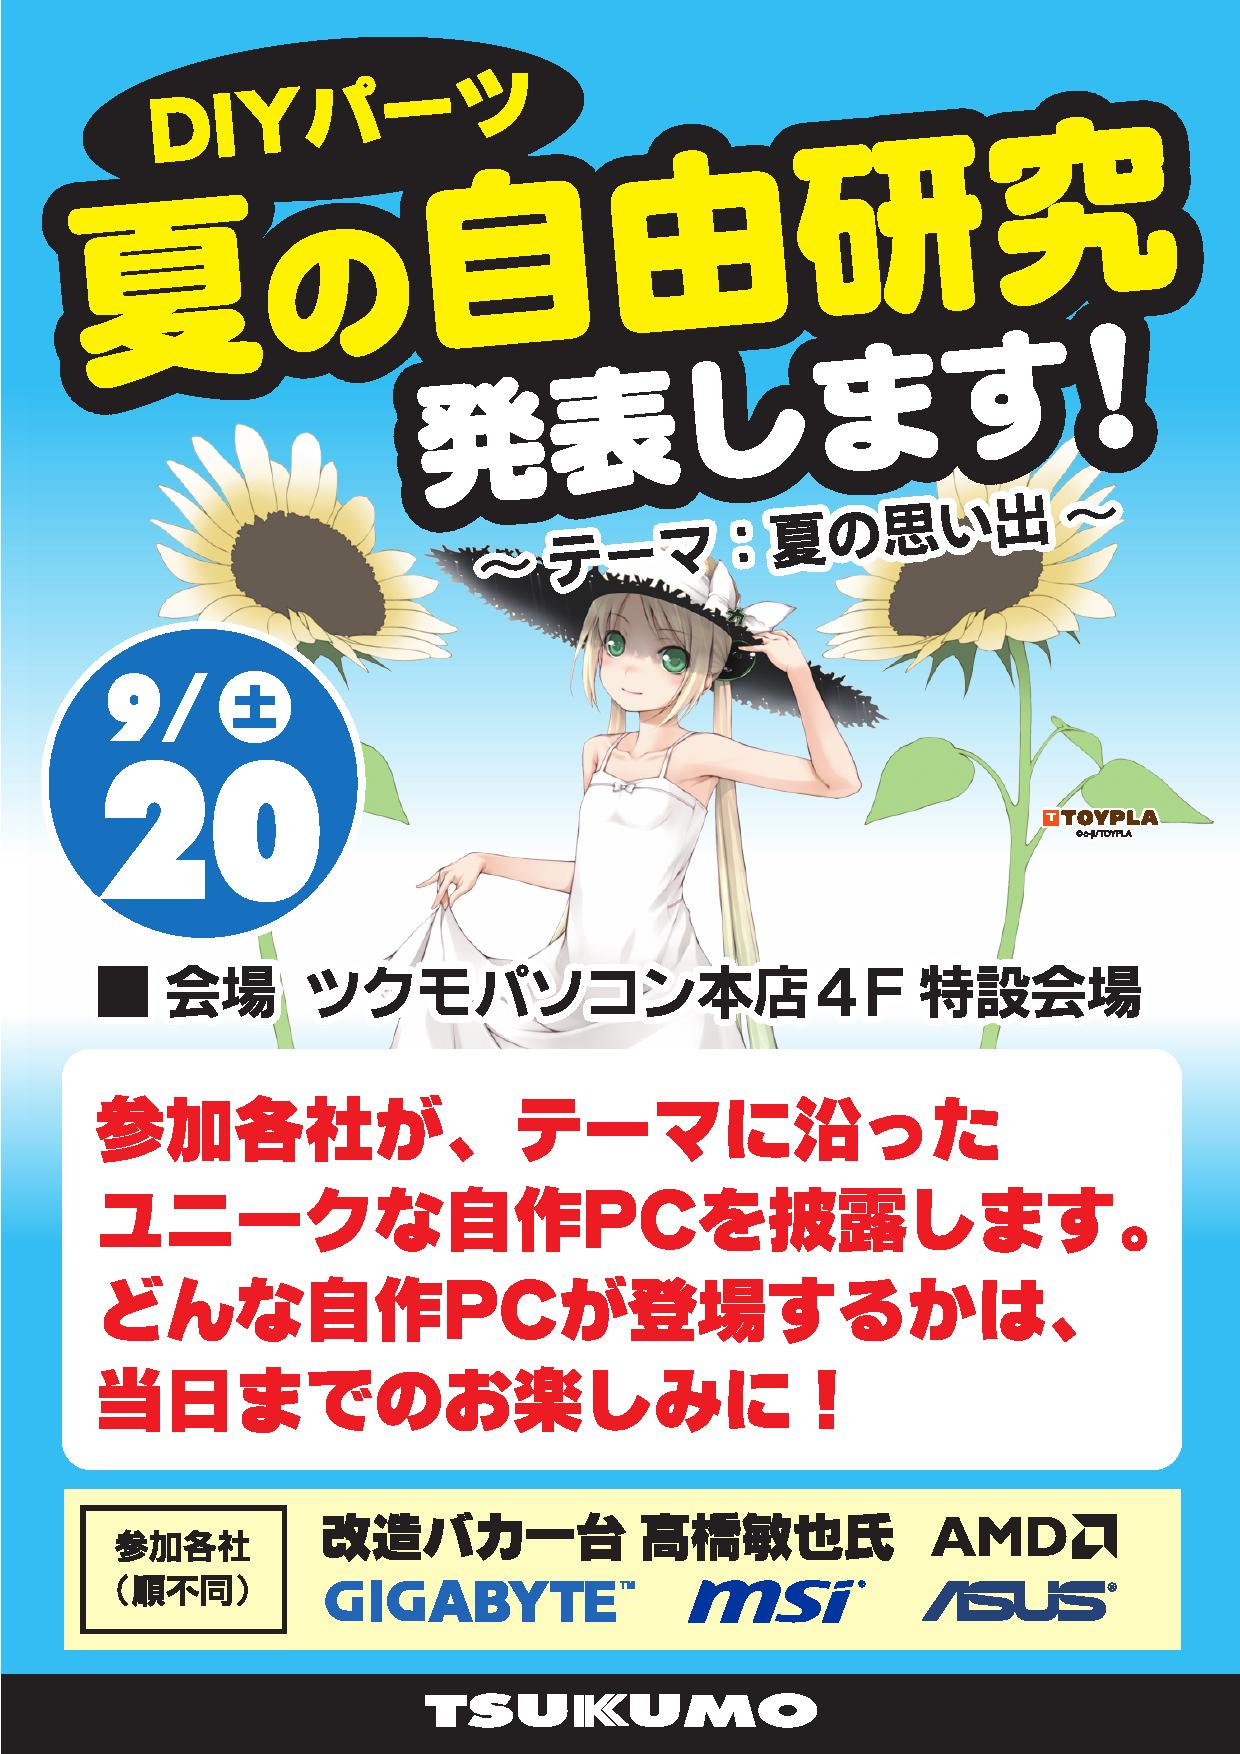 DIY 夏の自由研究0001.jpg